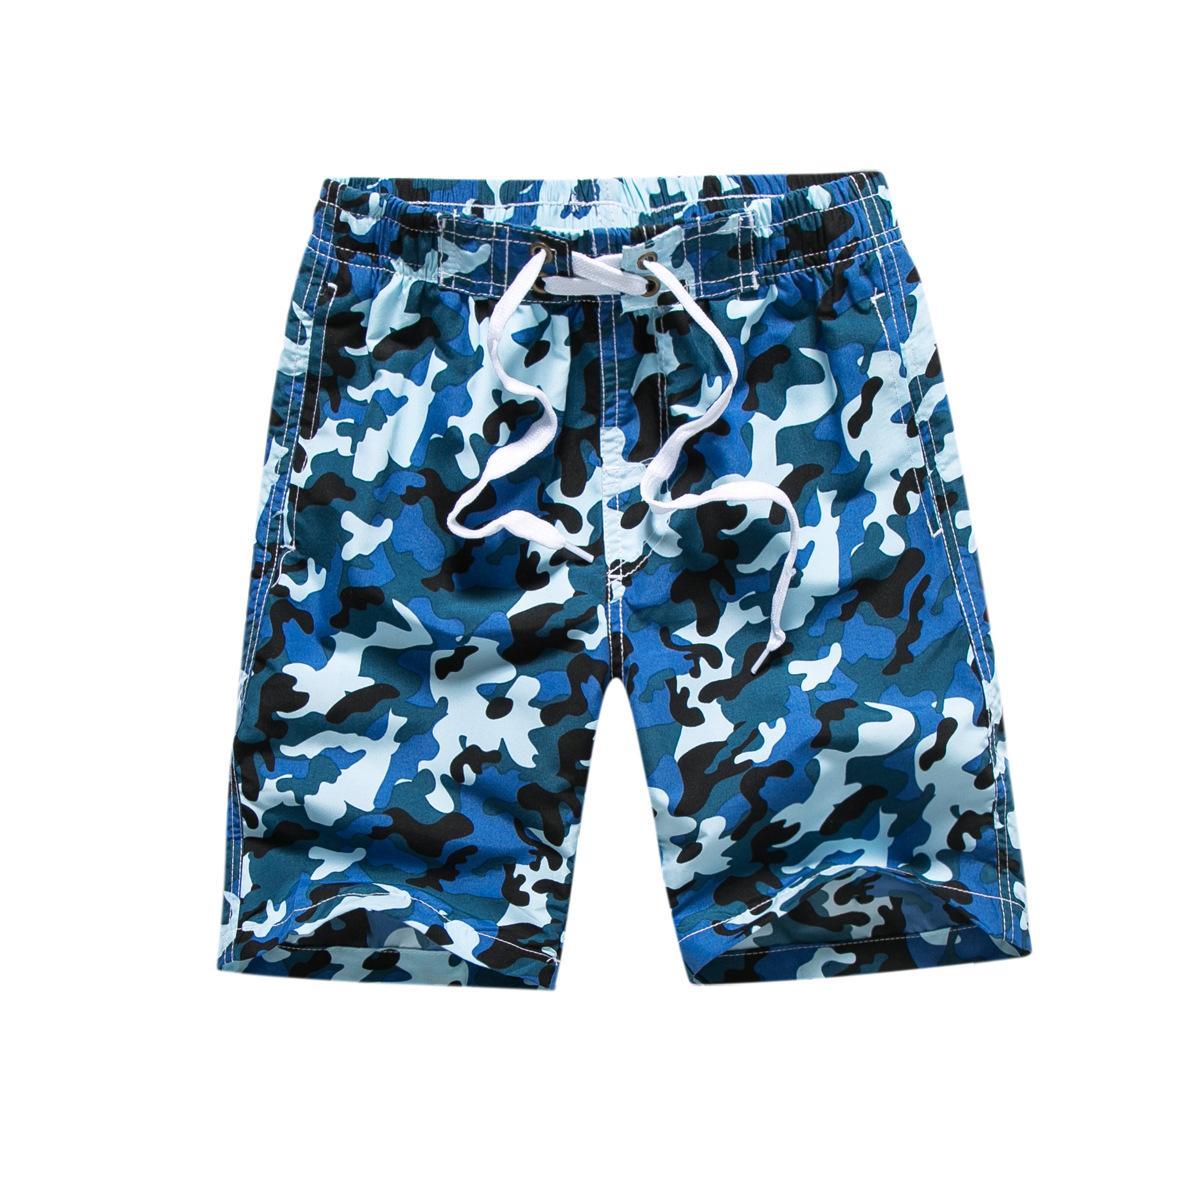 de Shorts Homens Tailorpallove Crianças Camouflage Praia Loose-Fit Casual Praia Surf Shorts MENINO DE 1709